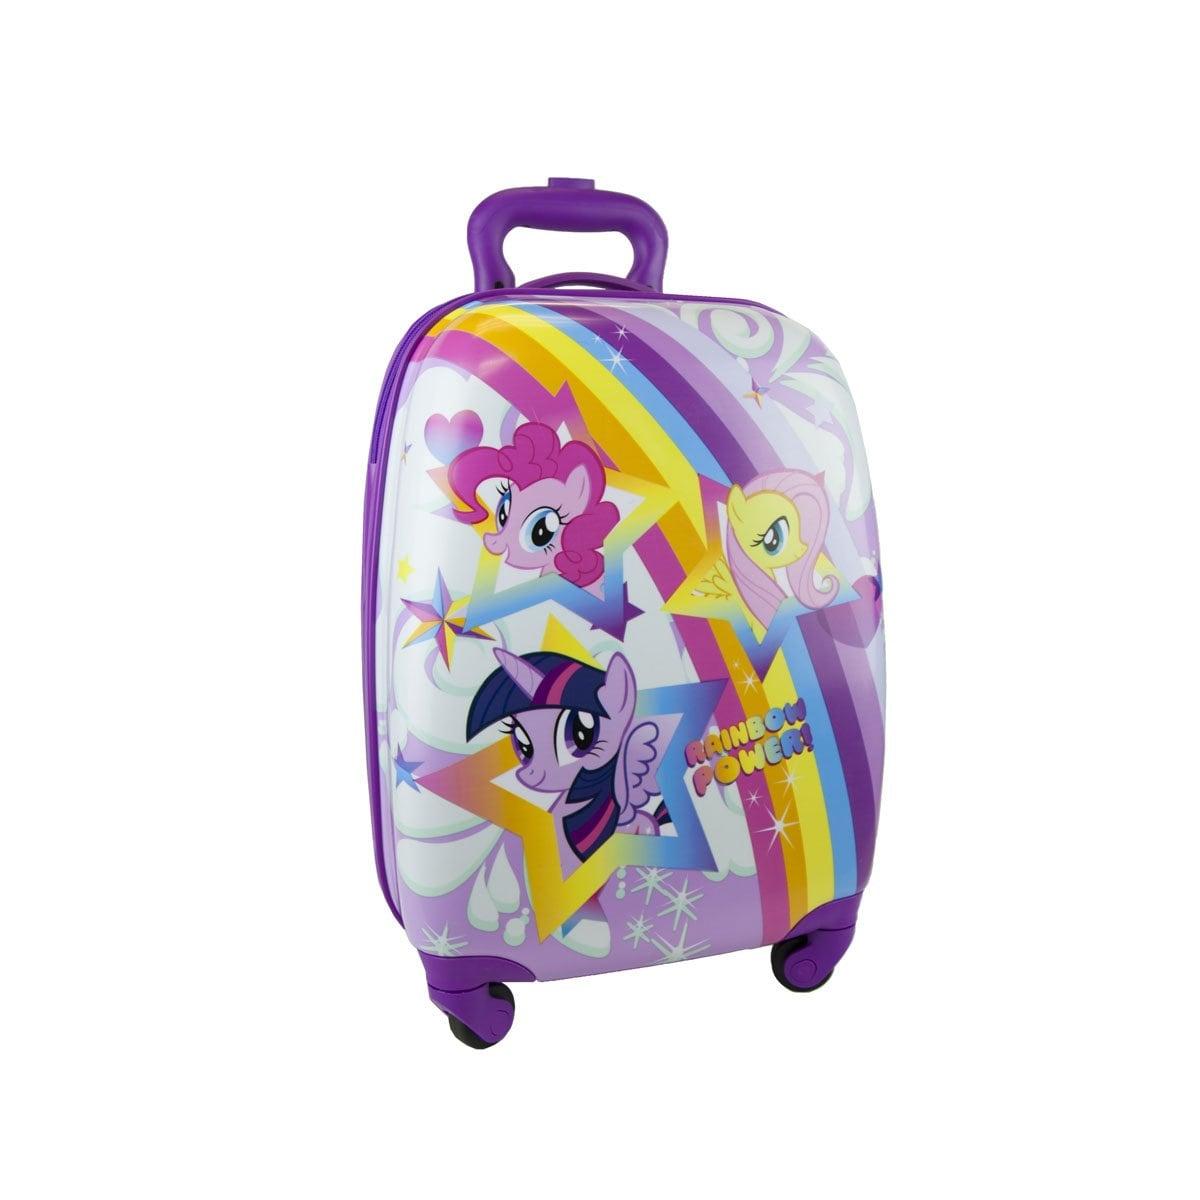 Maleta Abs 16 My Little Pony Photo Pack